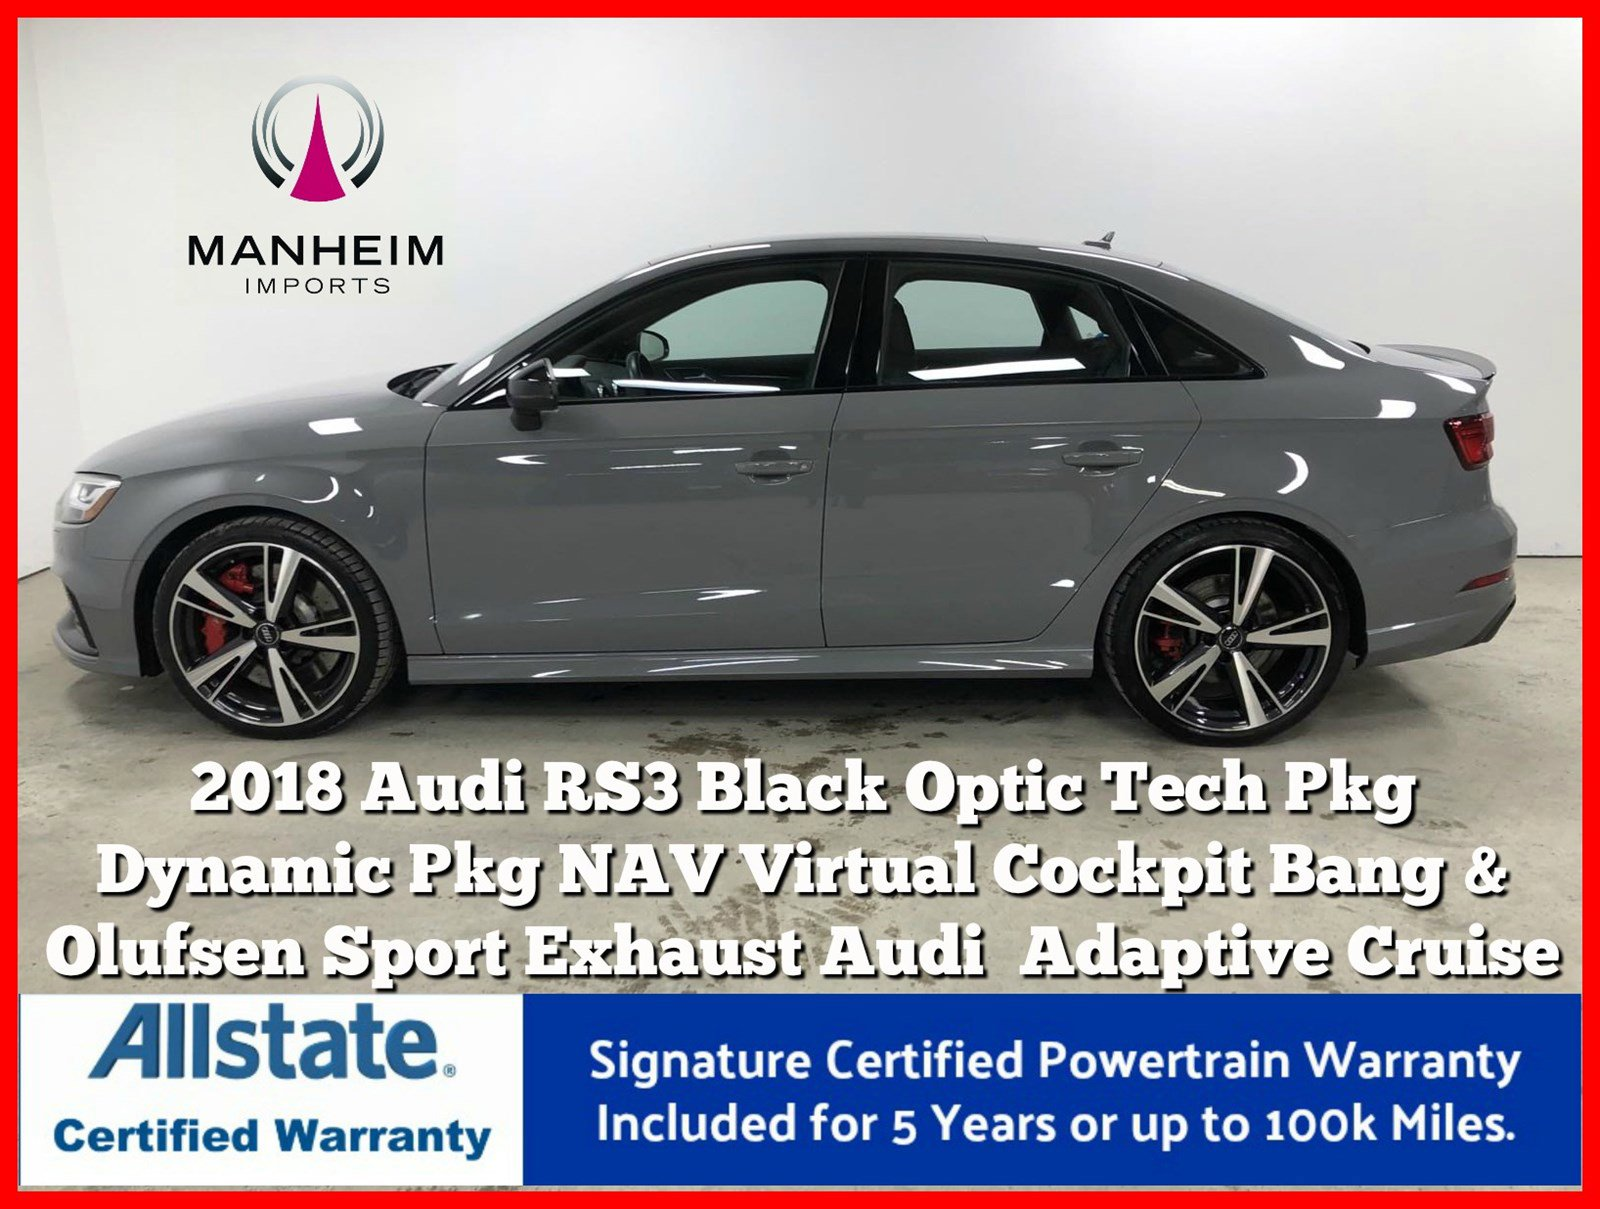 Pre-Owned 2018 Audi RS 3 Dynamic Black Optic